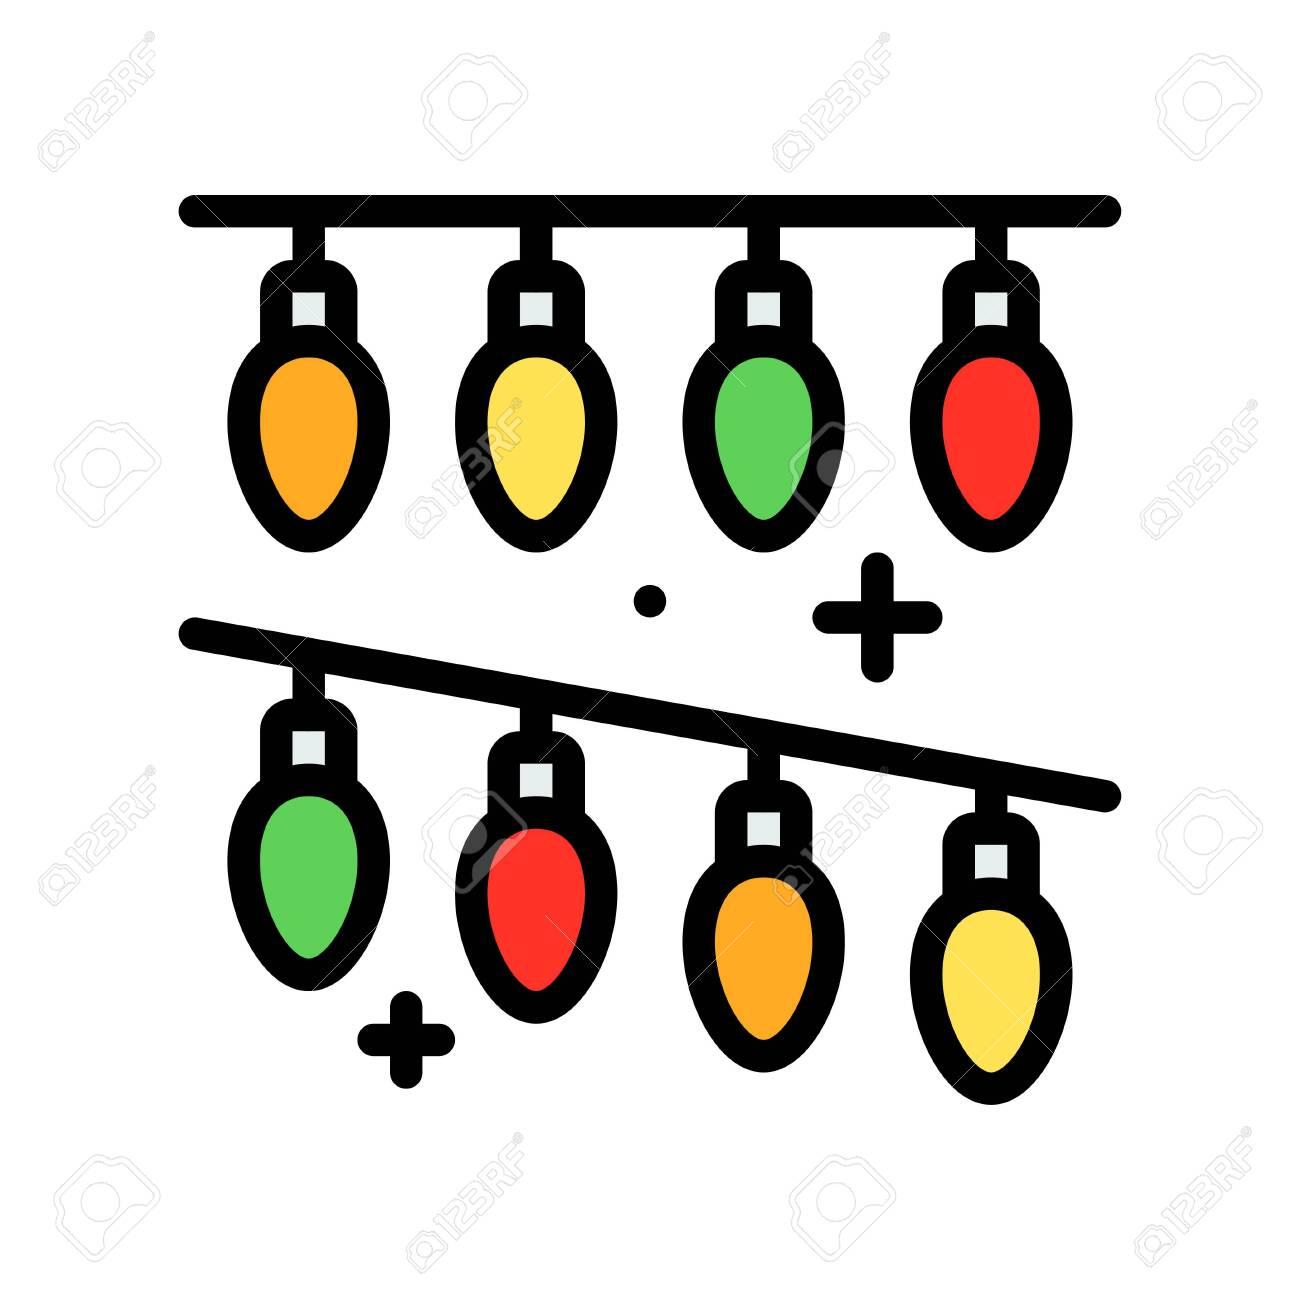 Christmas lights filled design icon, vector illustration - 136139980